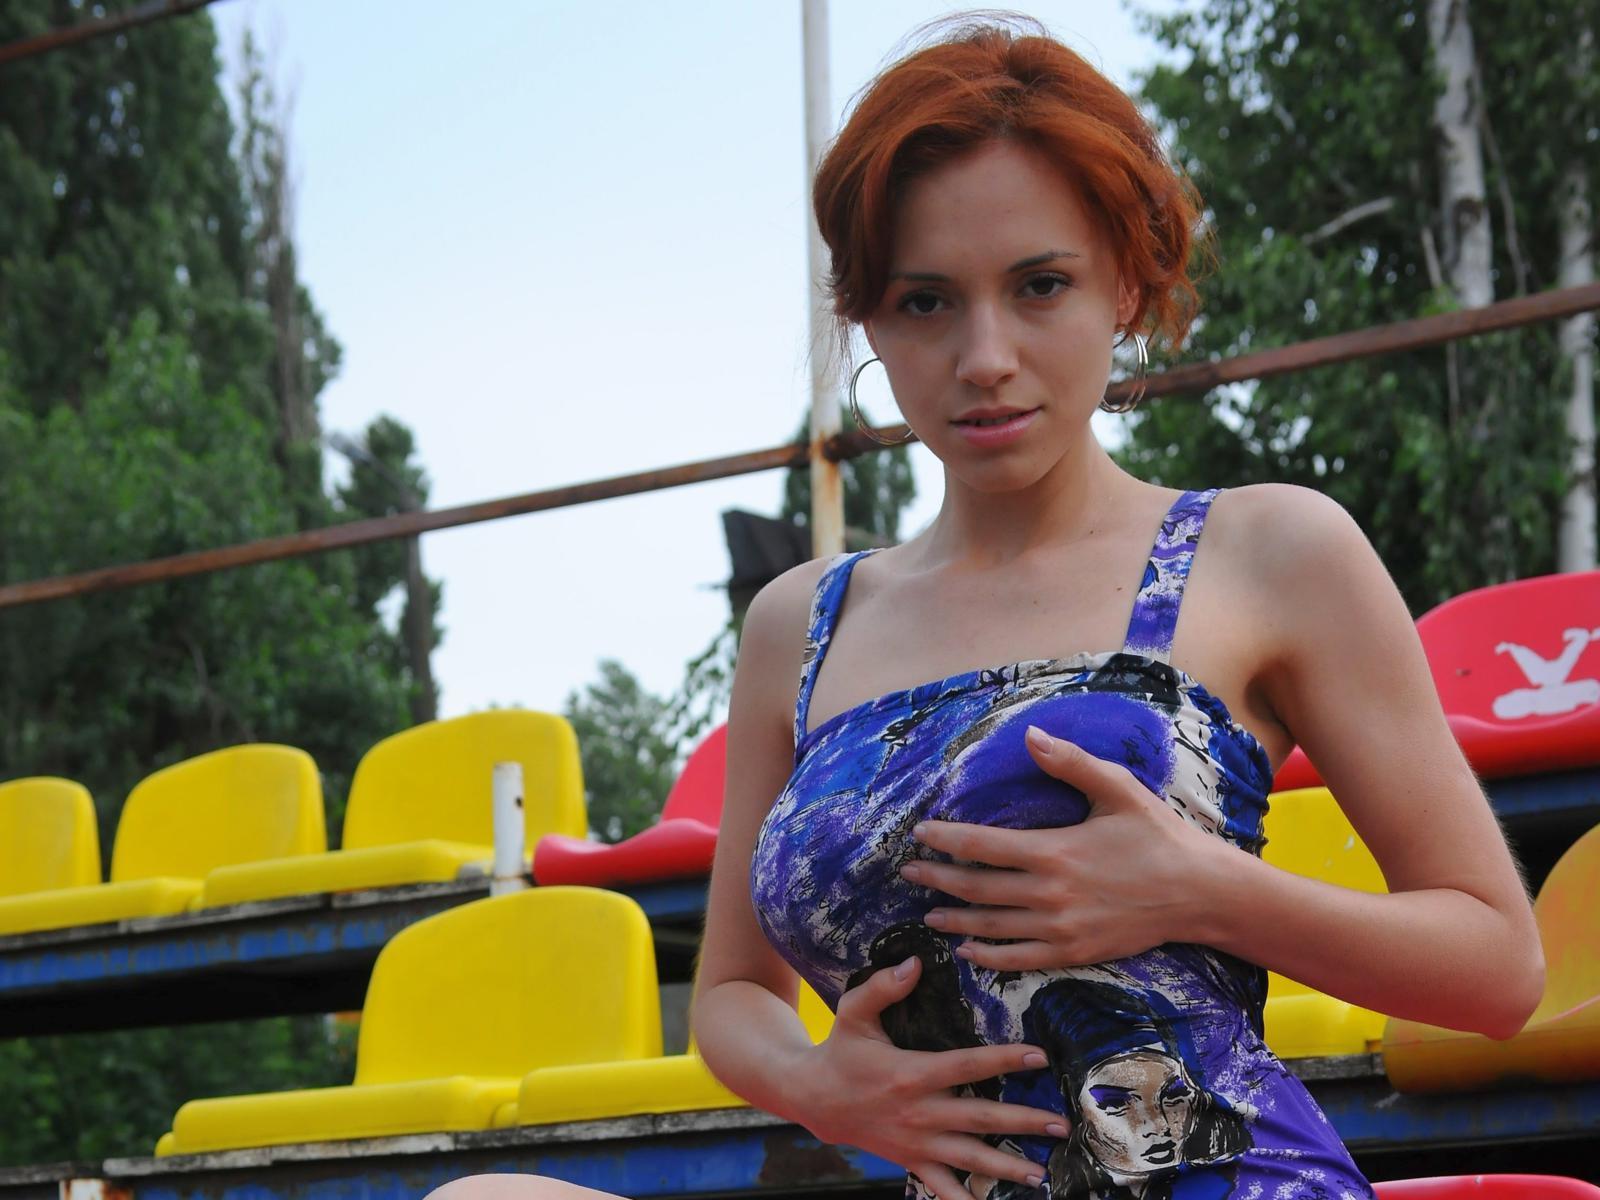 Download photo 1440x900, leka c, lera o, redhead, non nude